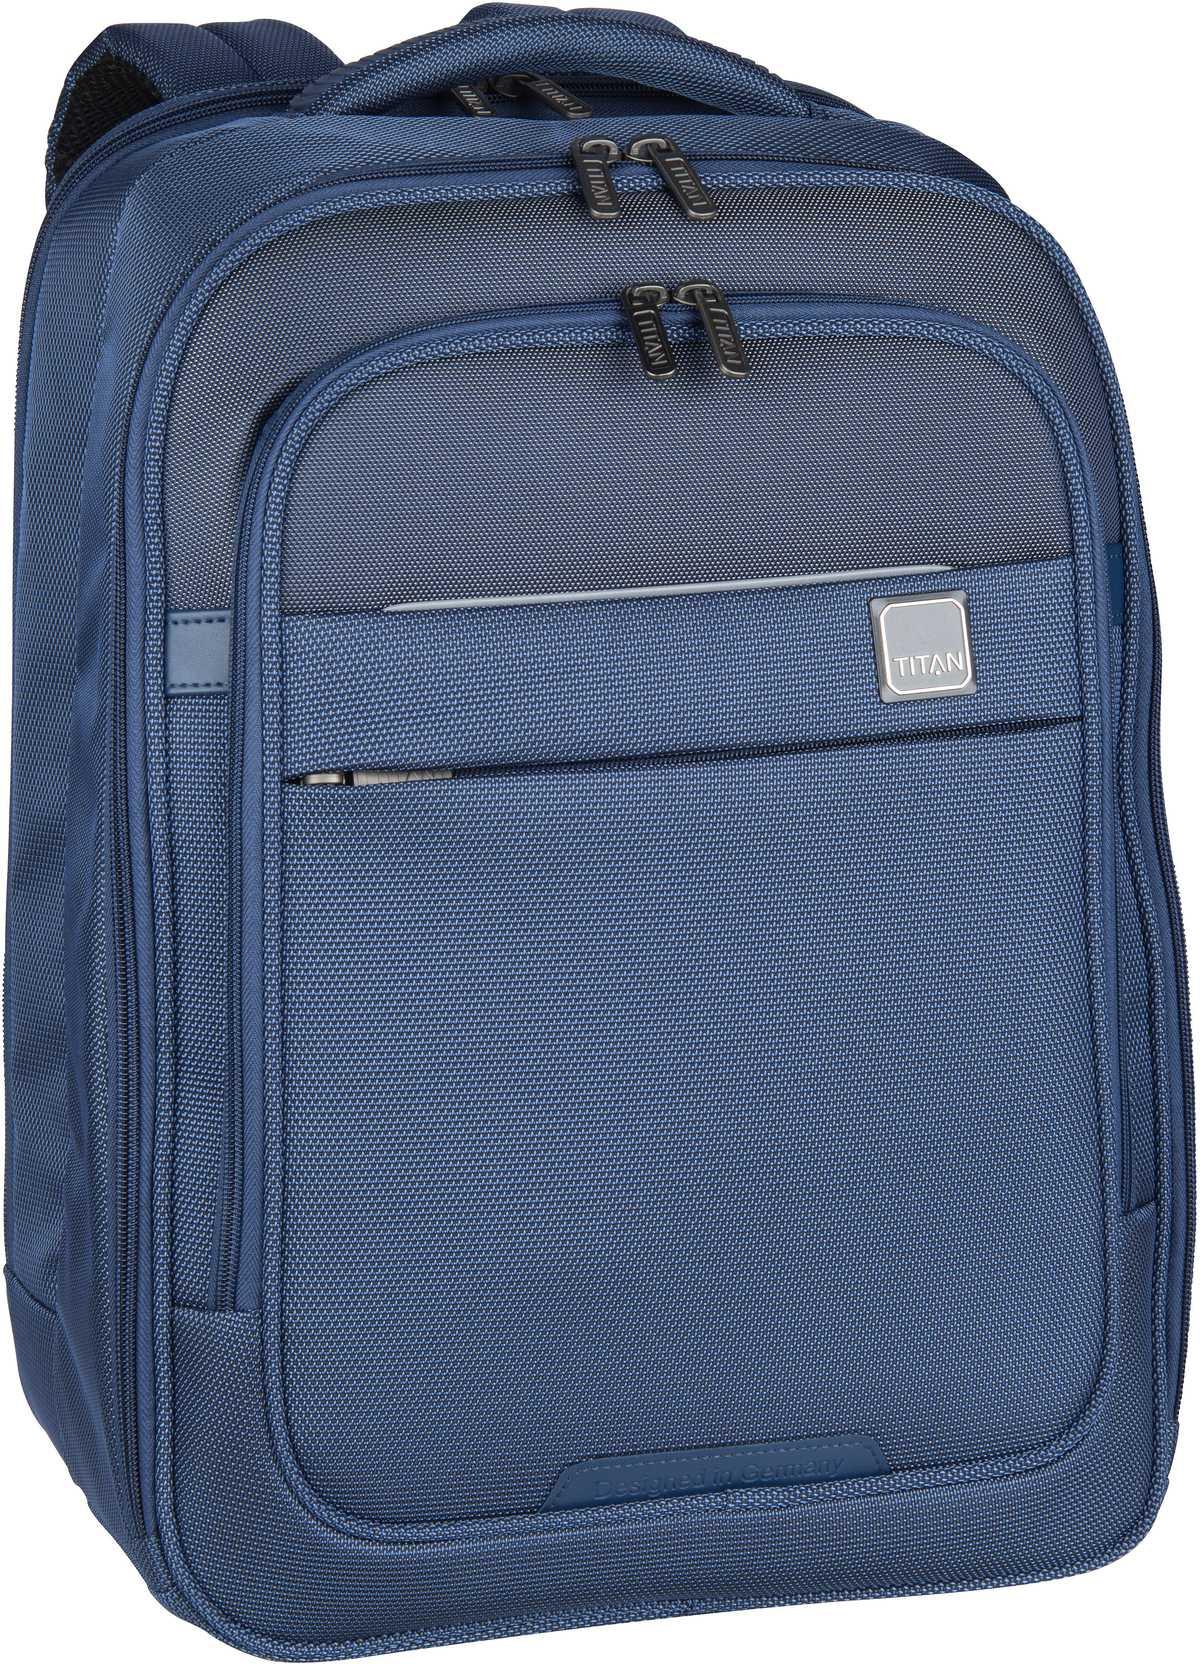 Rucksack / Daypack Prime Backpack Navy (29 Liter)